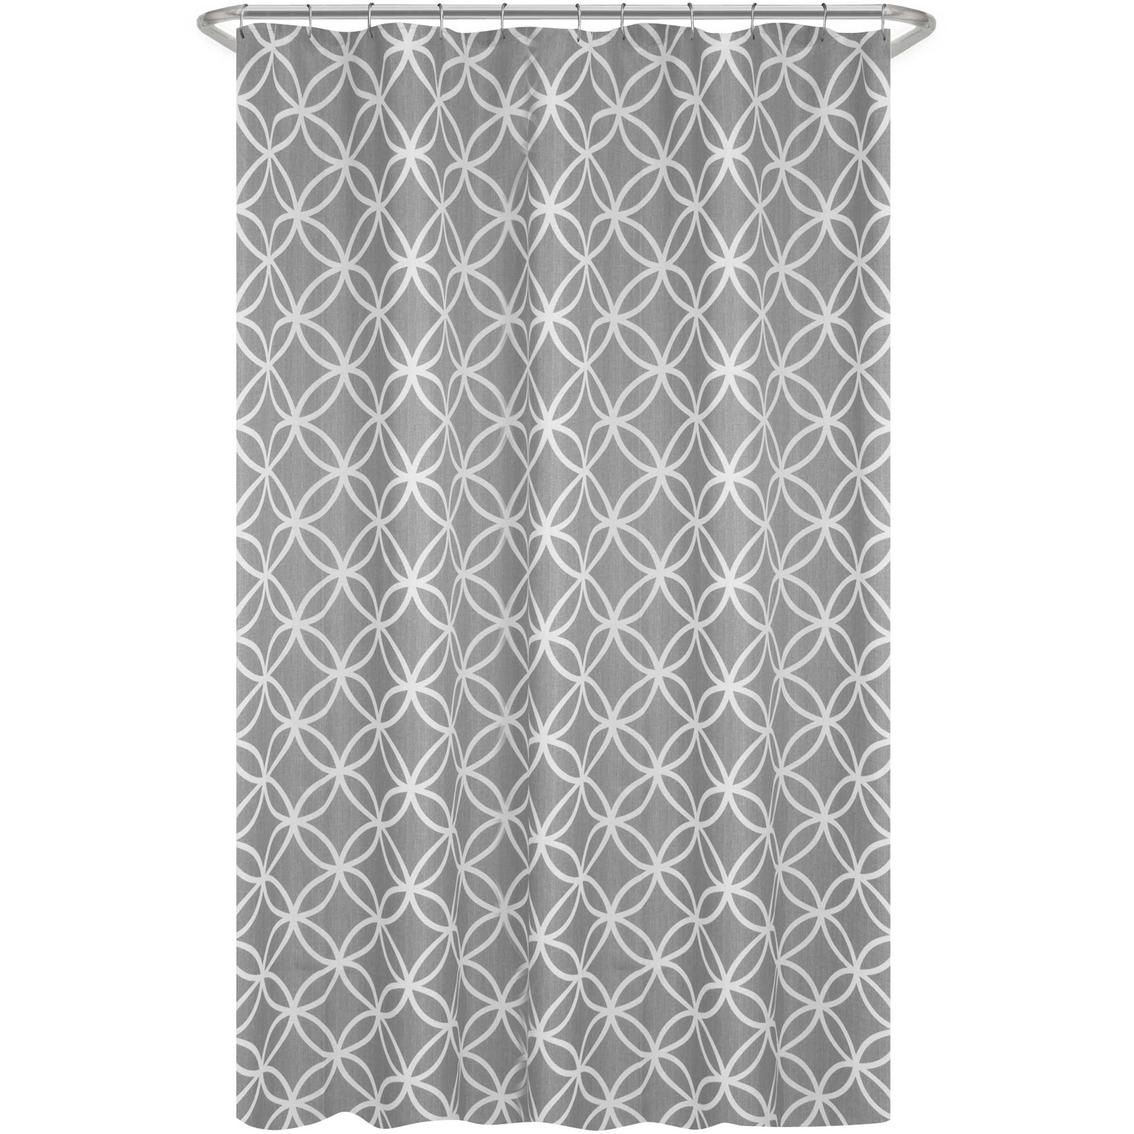 Maytex Emma Fabric Shower Curtain Gray Shower Curtains